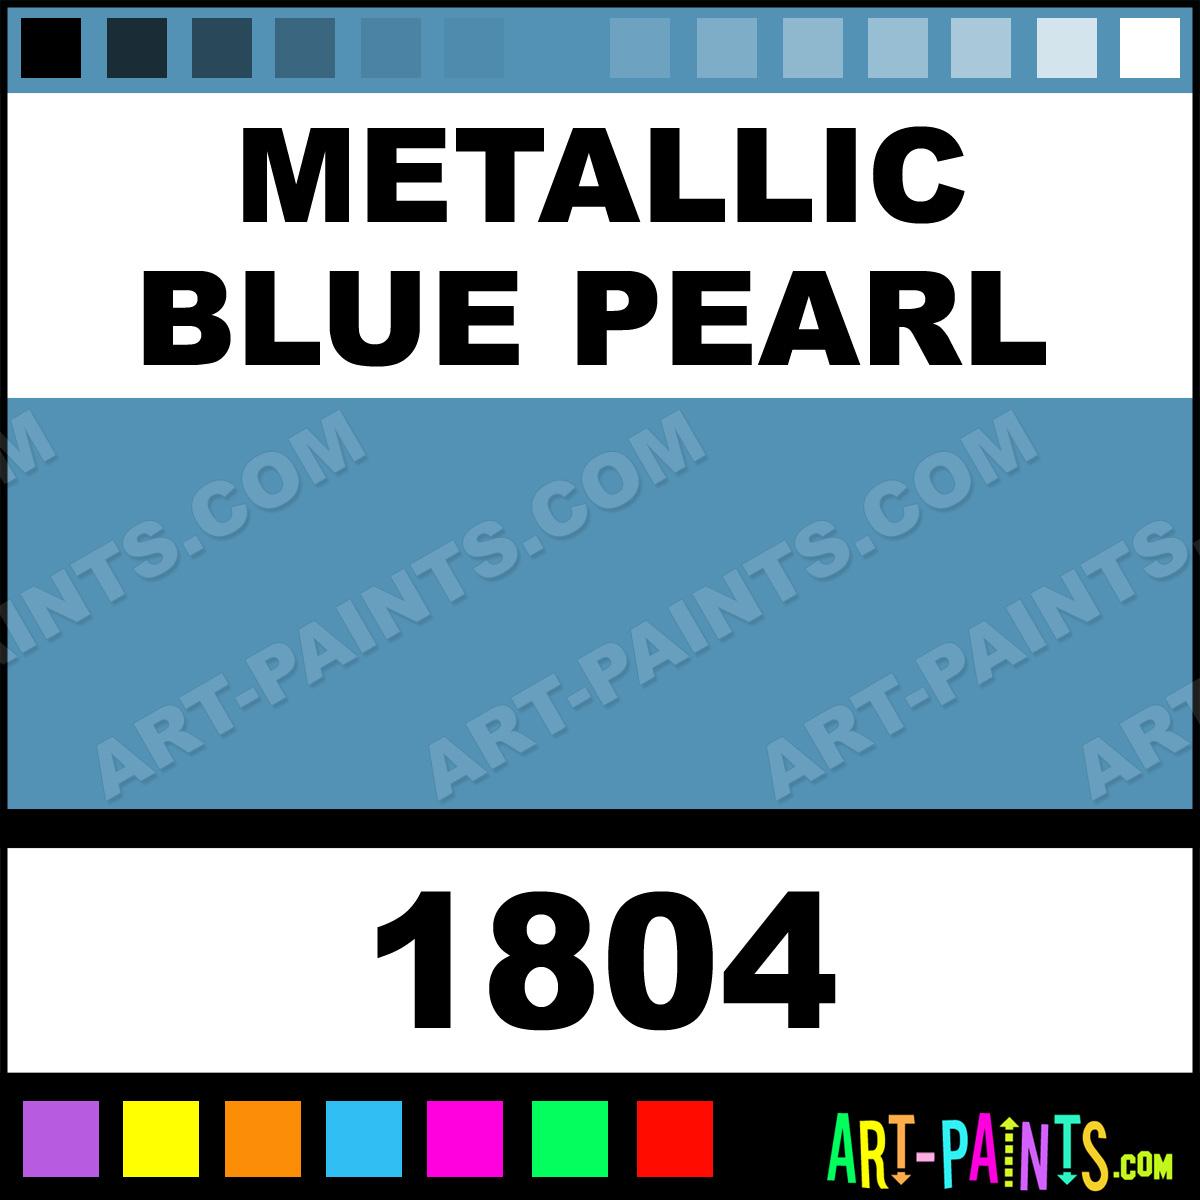 Metallic Blue Pearl Enamel Spray Paints Aerosol